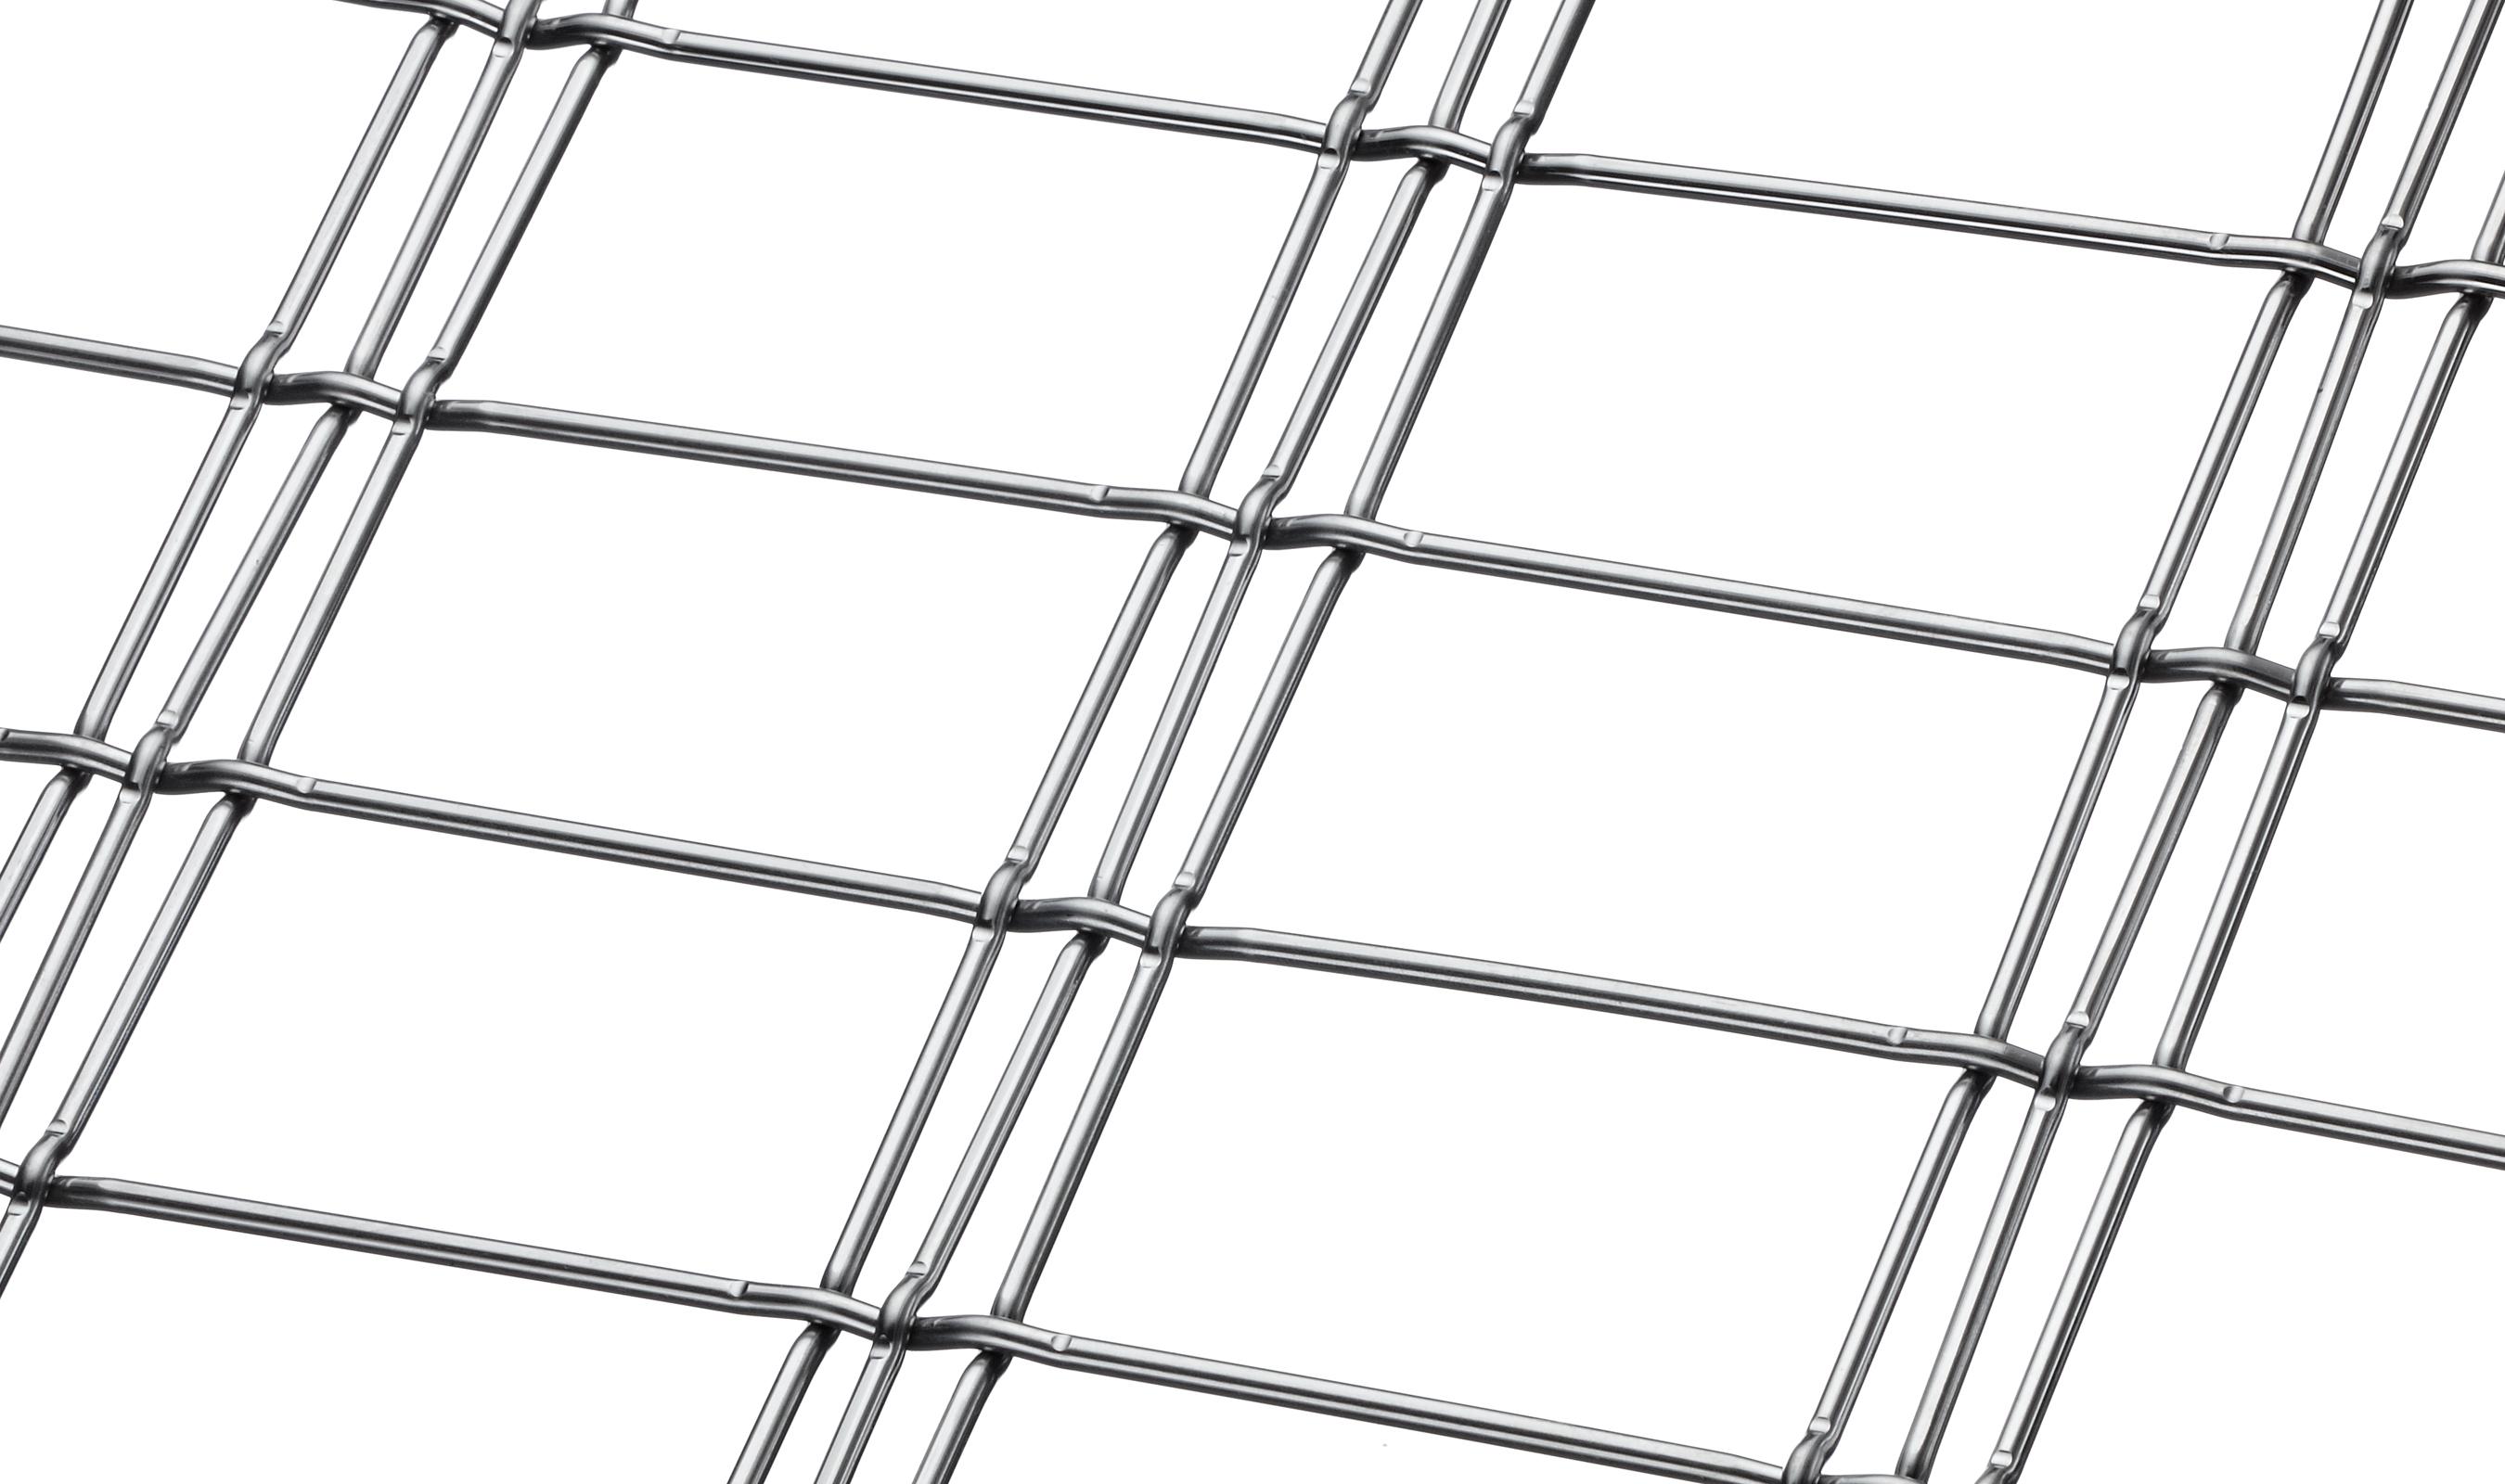 M13Z-141 architectural wire mesh triple shute pattern